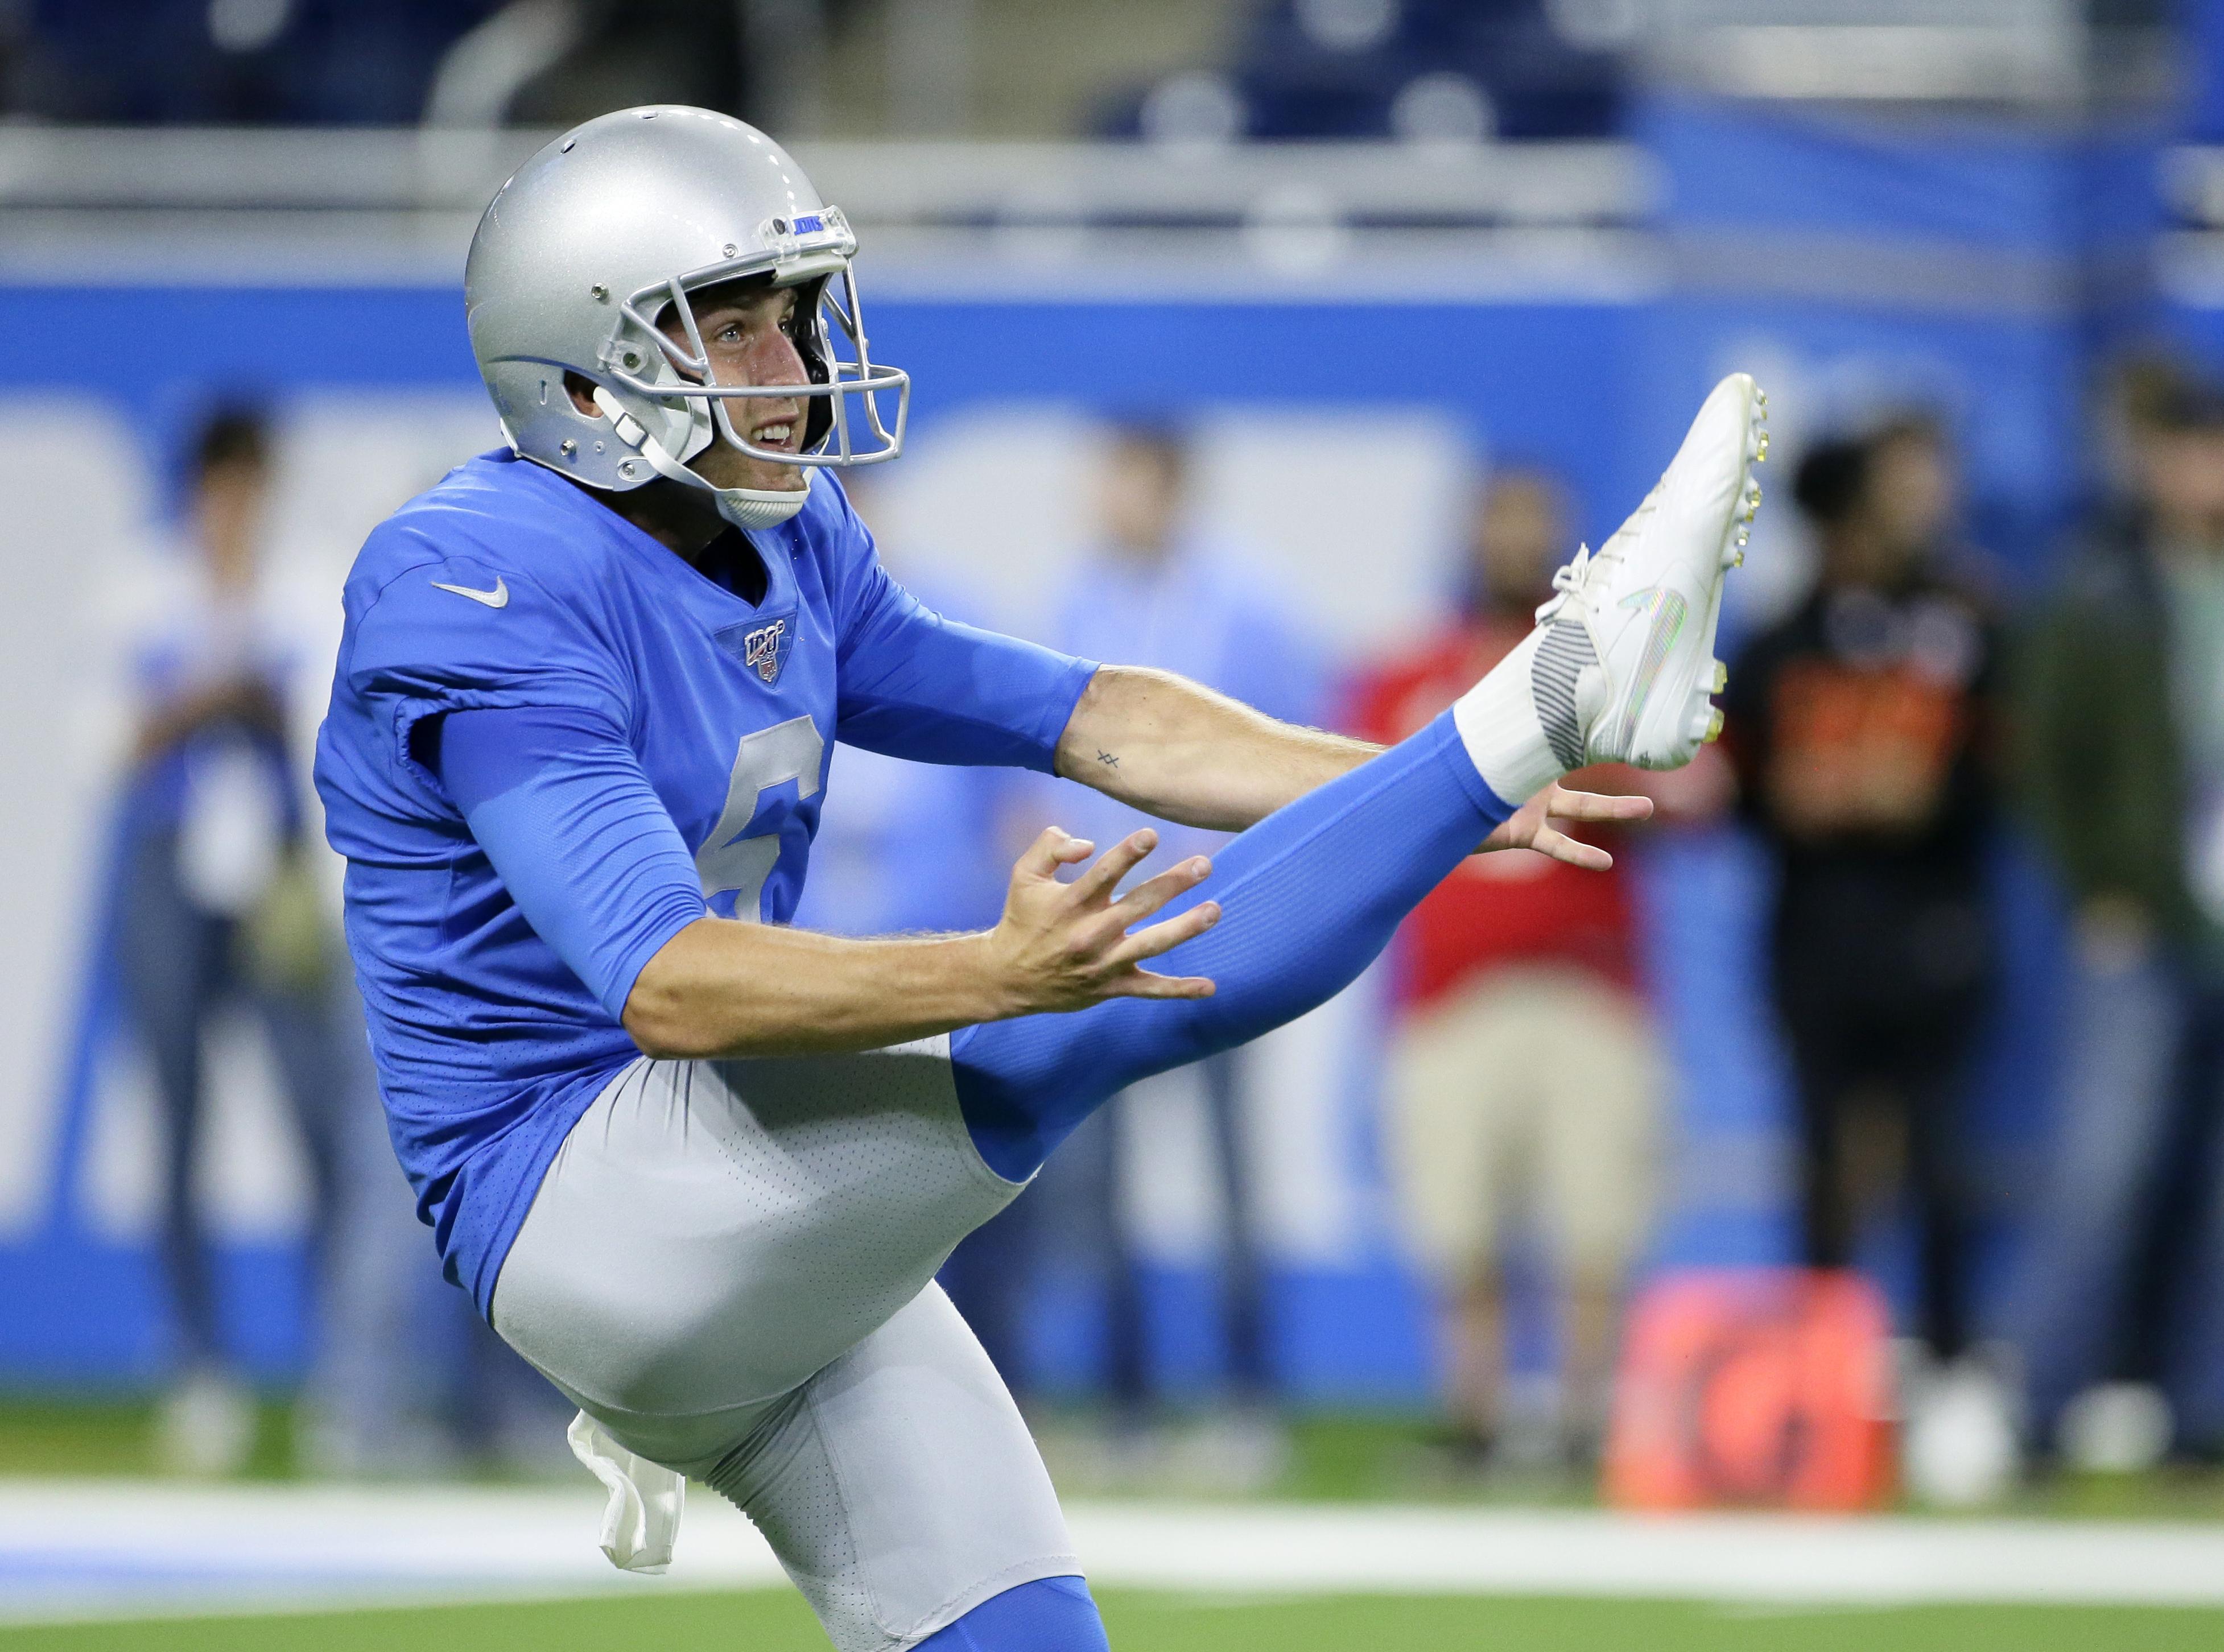 Broncos sign punter Sam Martin to three-year deal